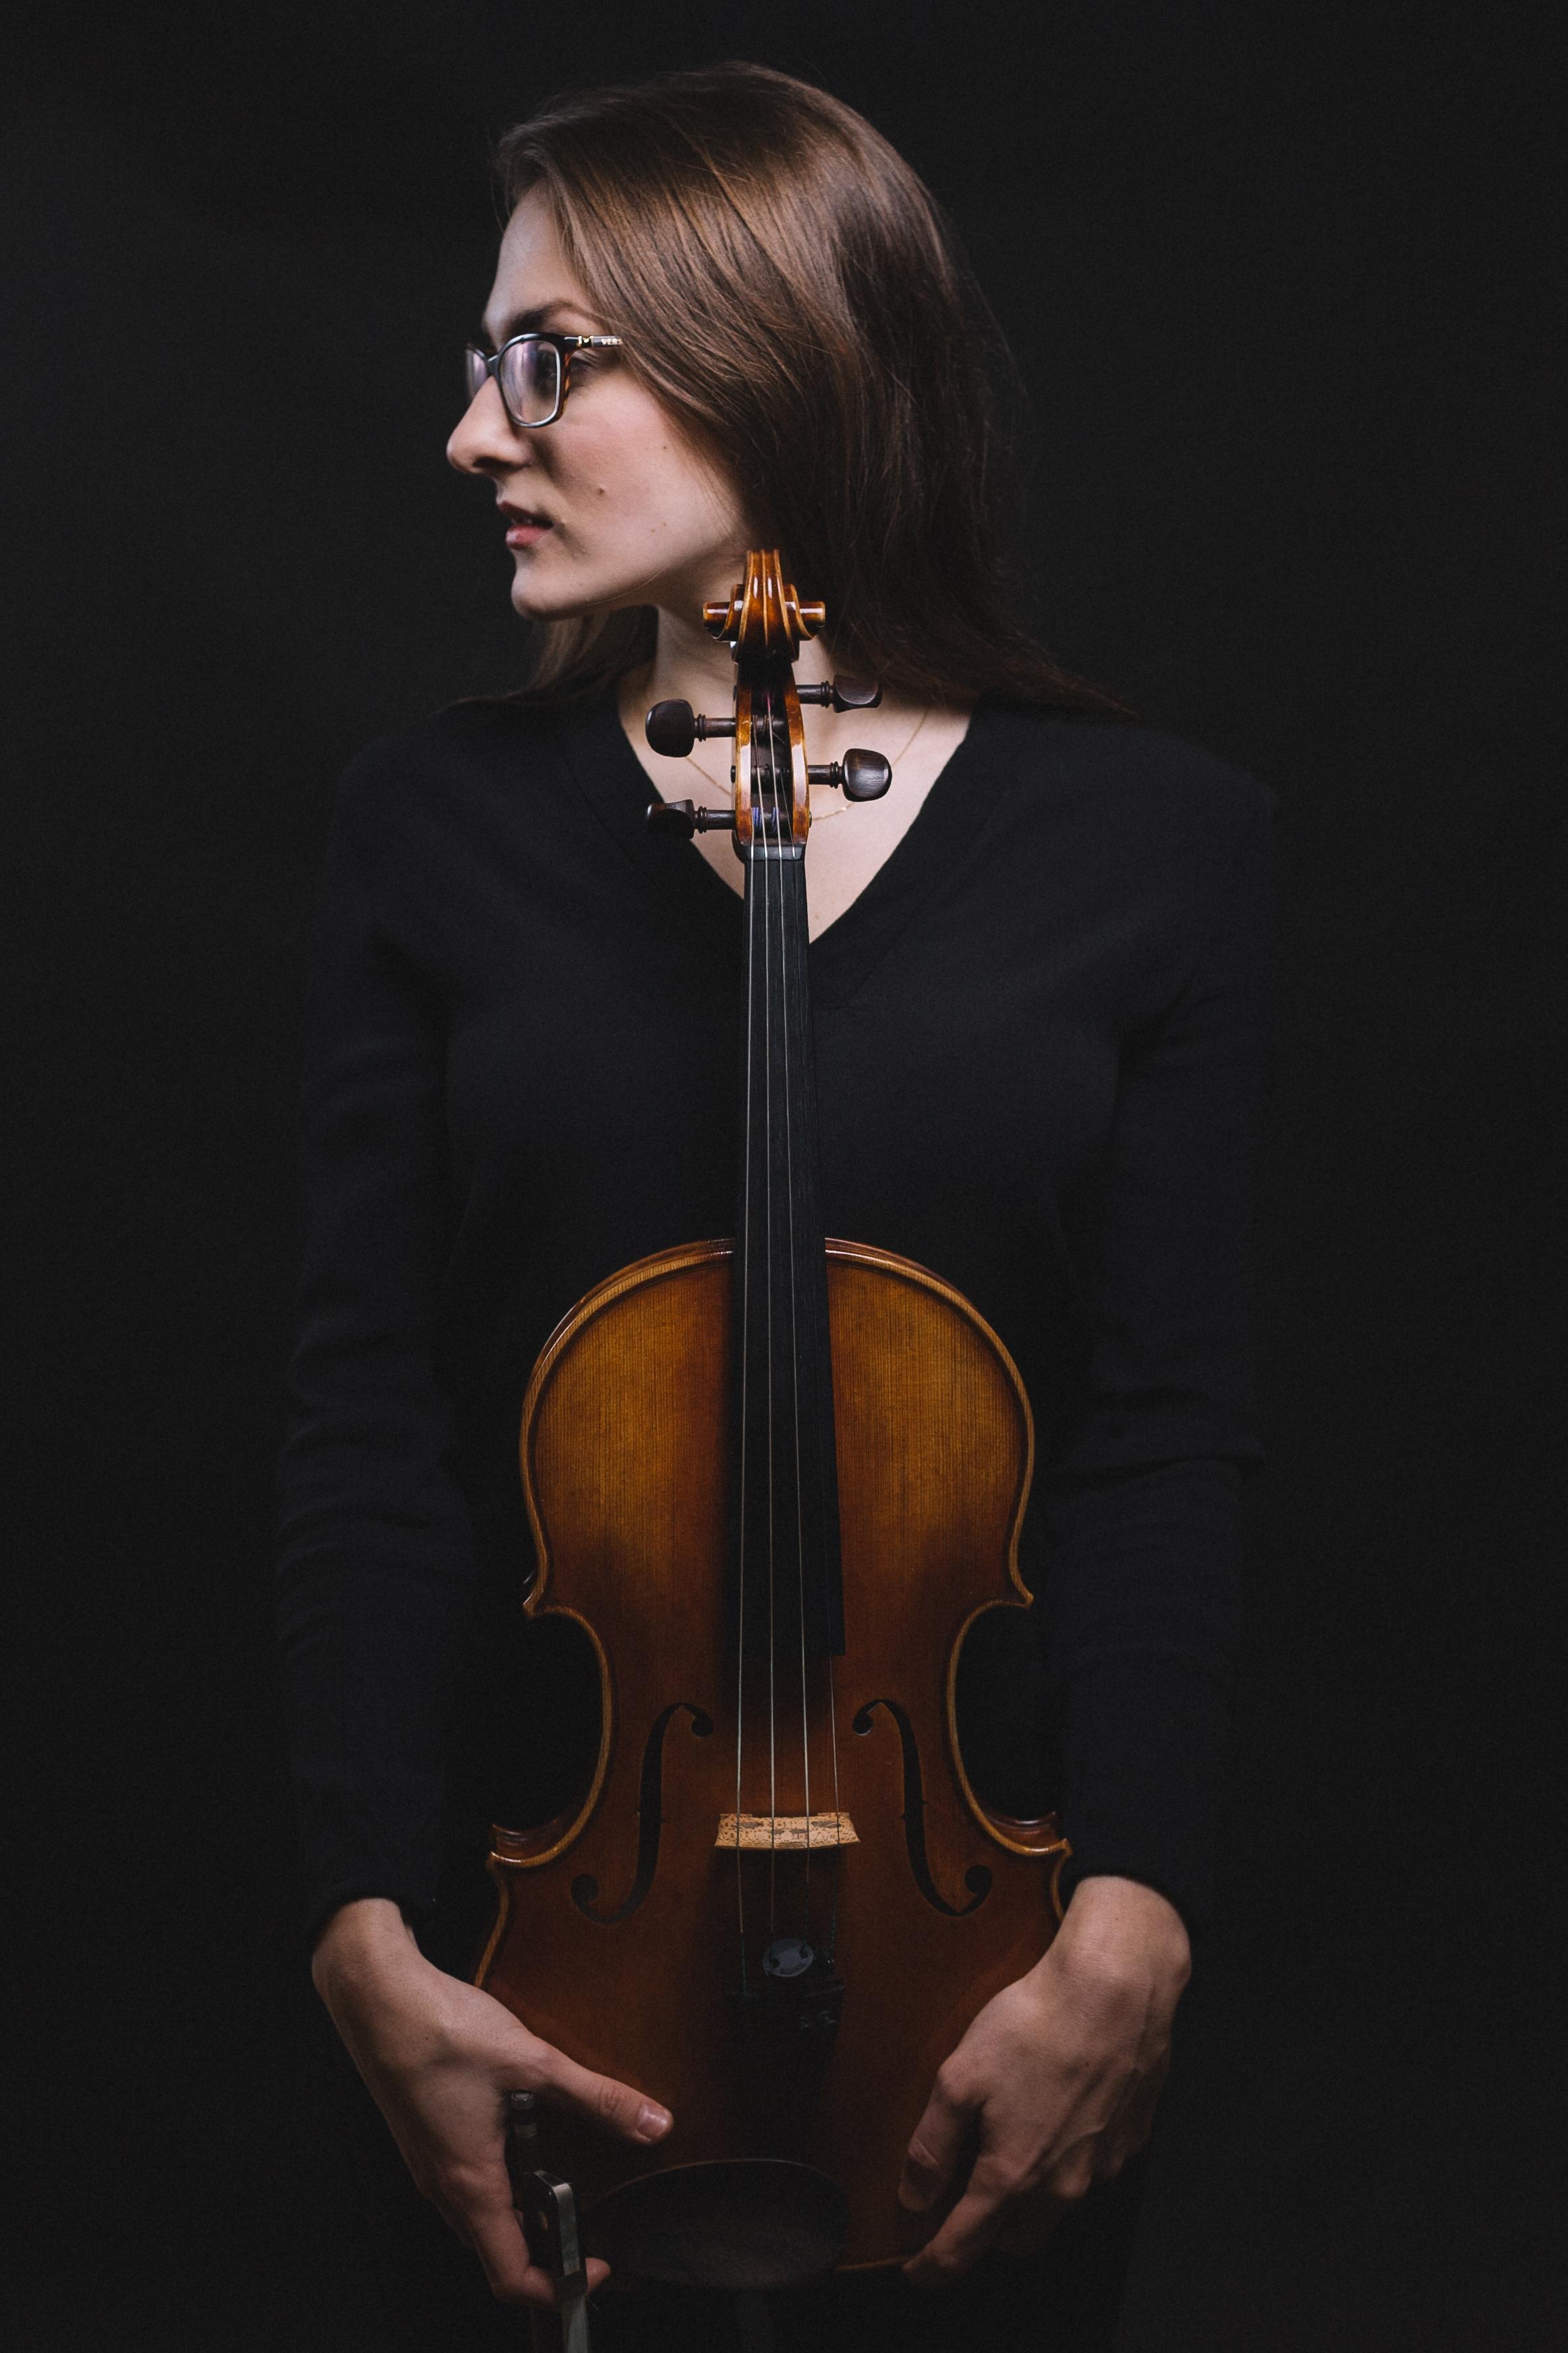 Anna Krzyżak - Violist